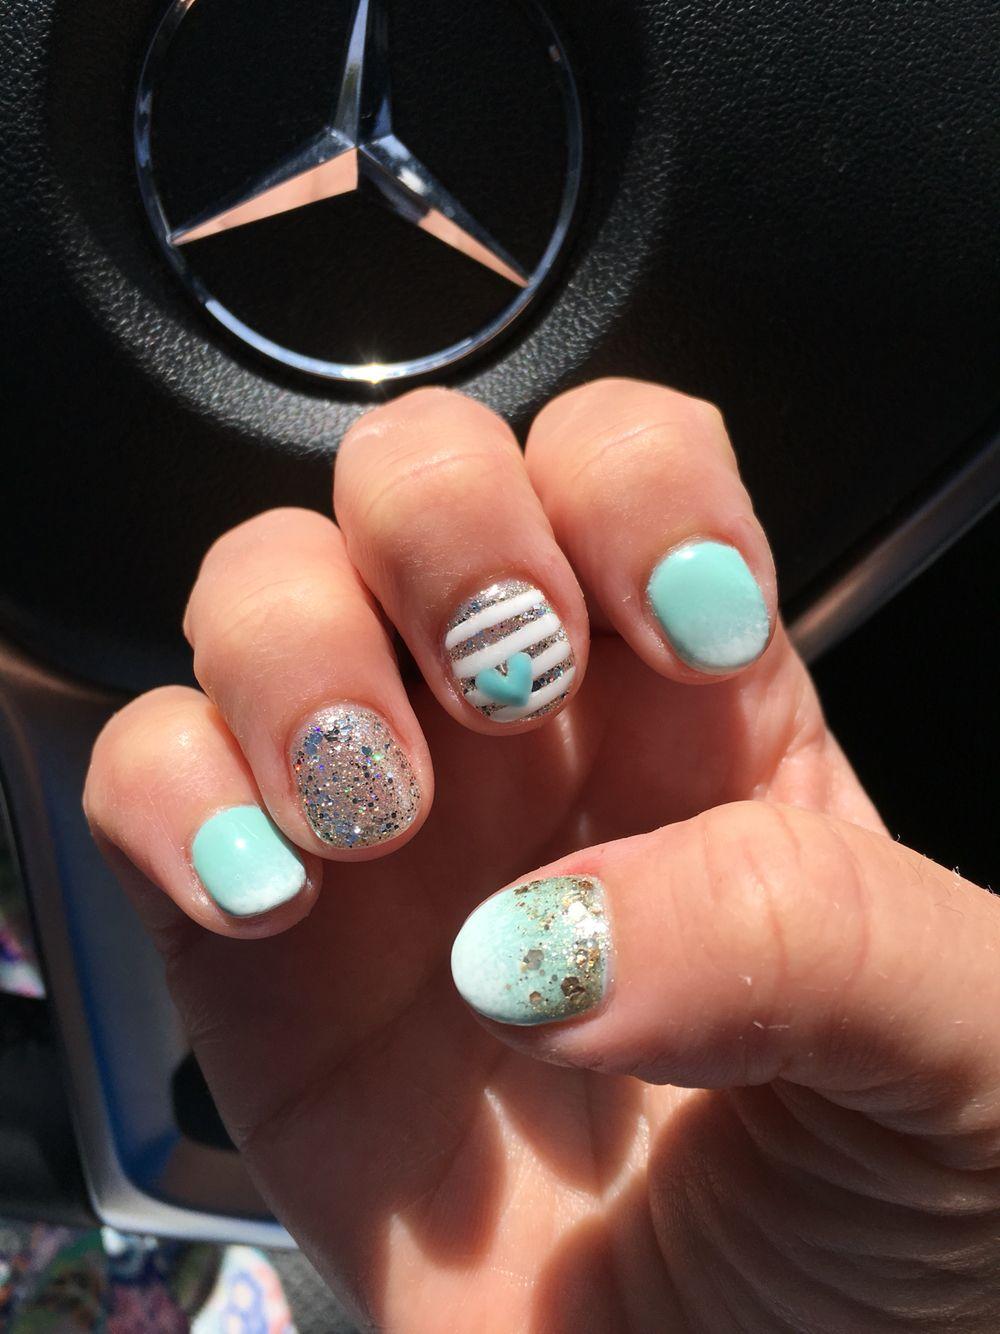 Reverse ombré nail art CK Nails, Closter NJ | Nails | Pinterest